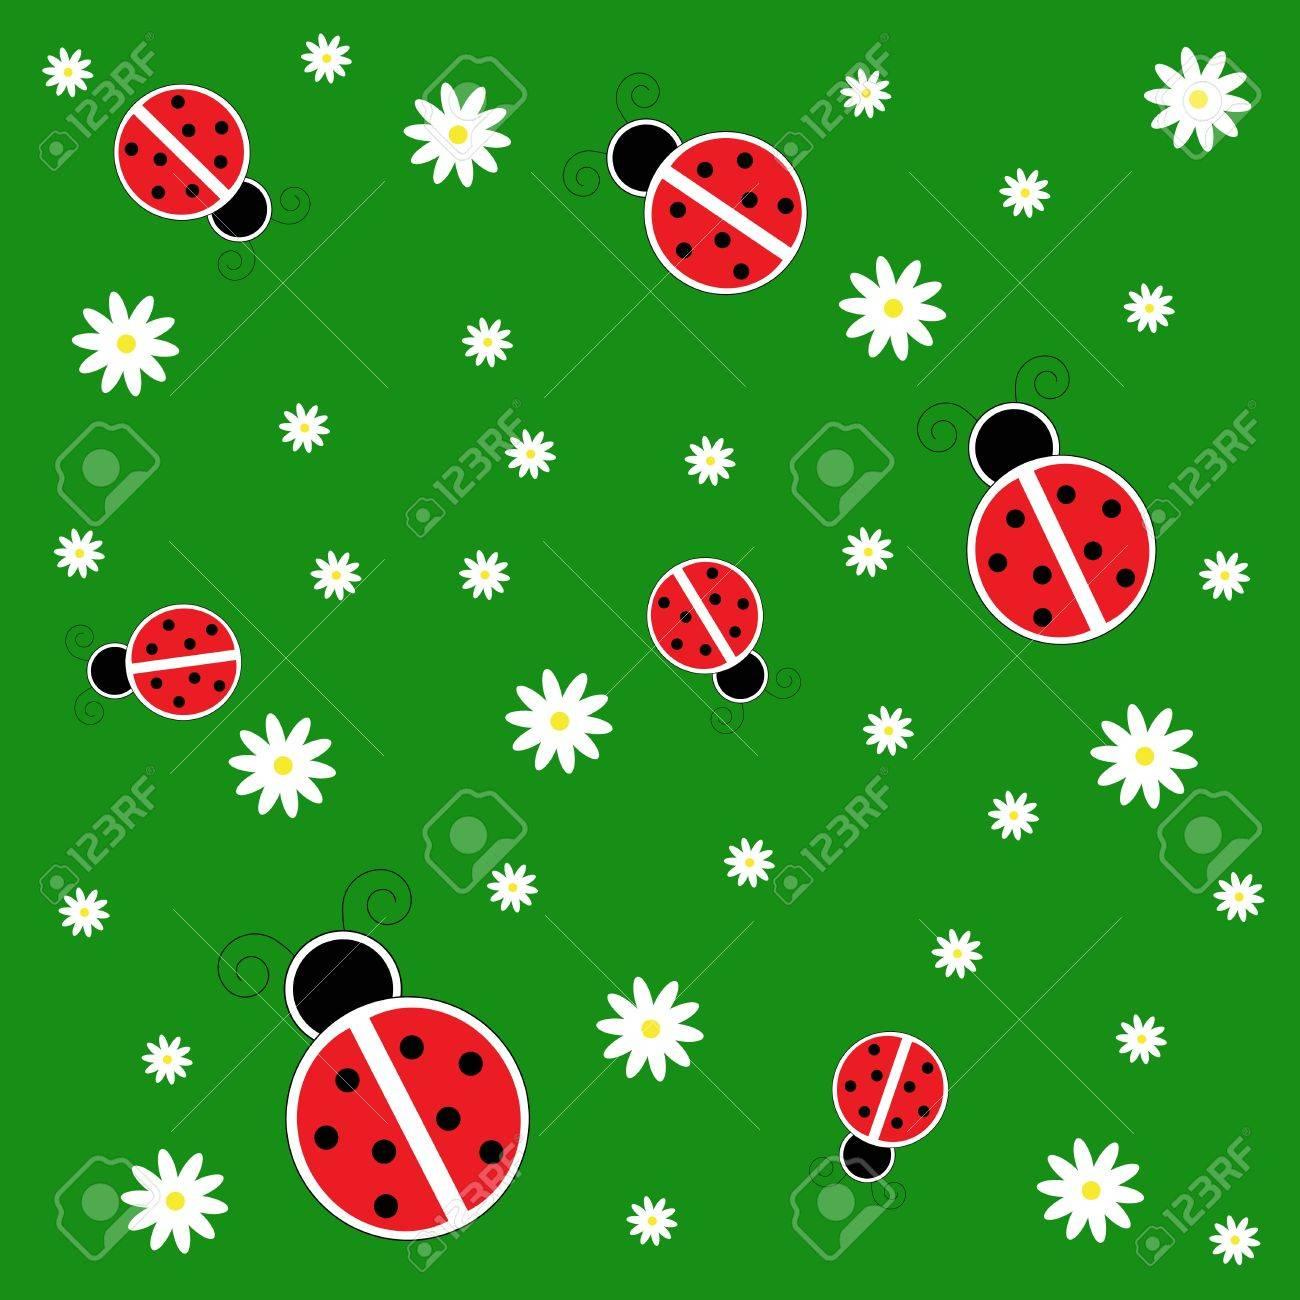 Ladybugs on Grass Stock Vector - 11085383